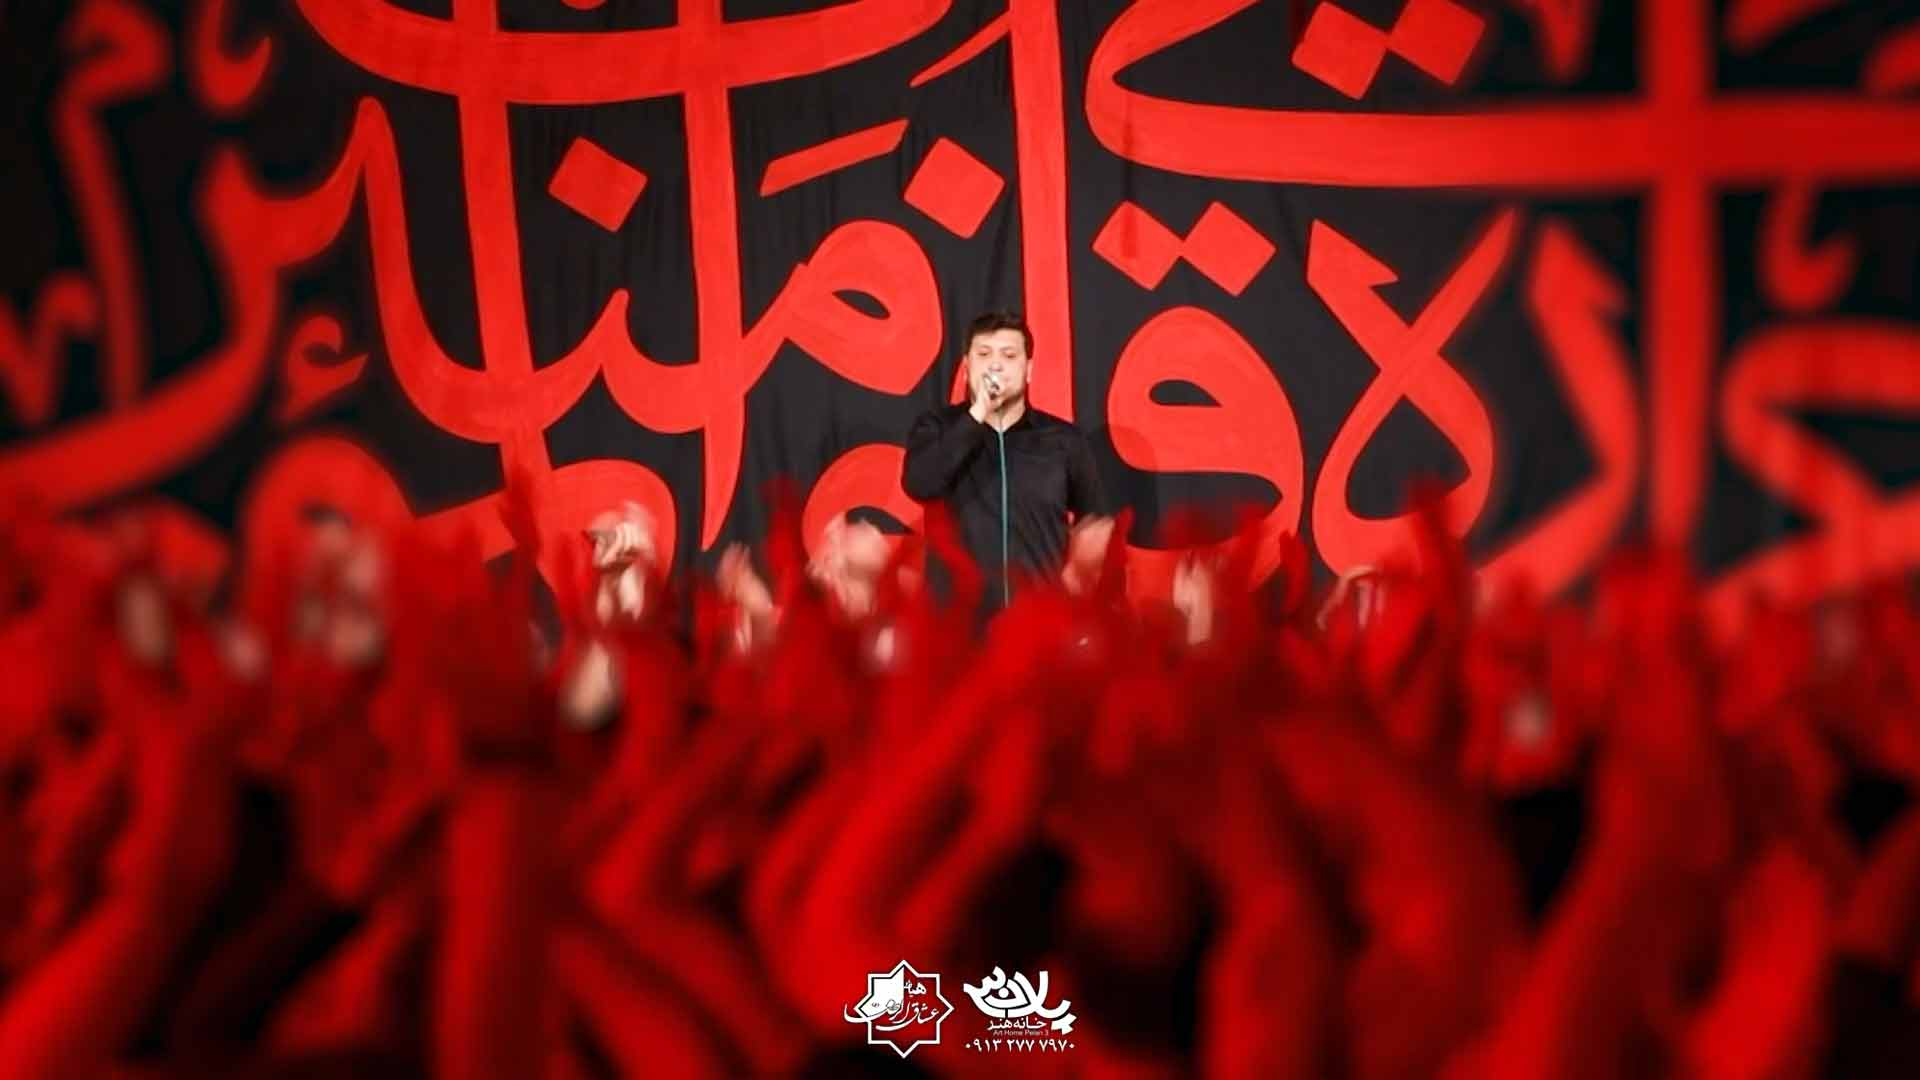 عباسم و در پی خطر میگردم محمدرضا ناصری